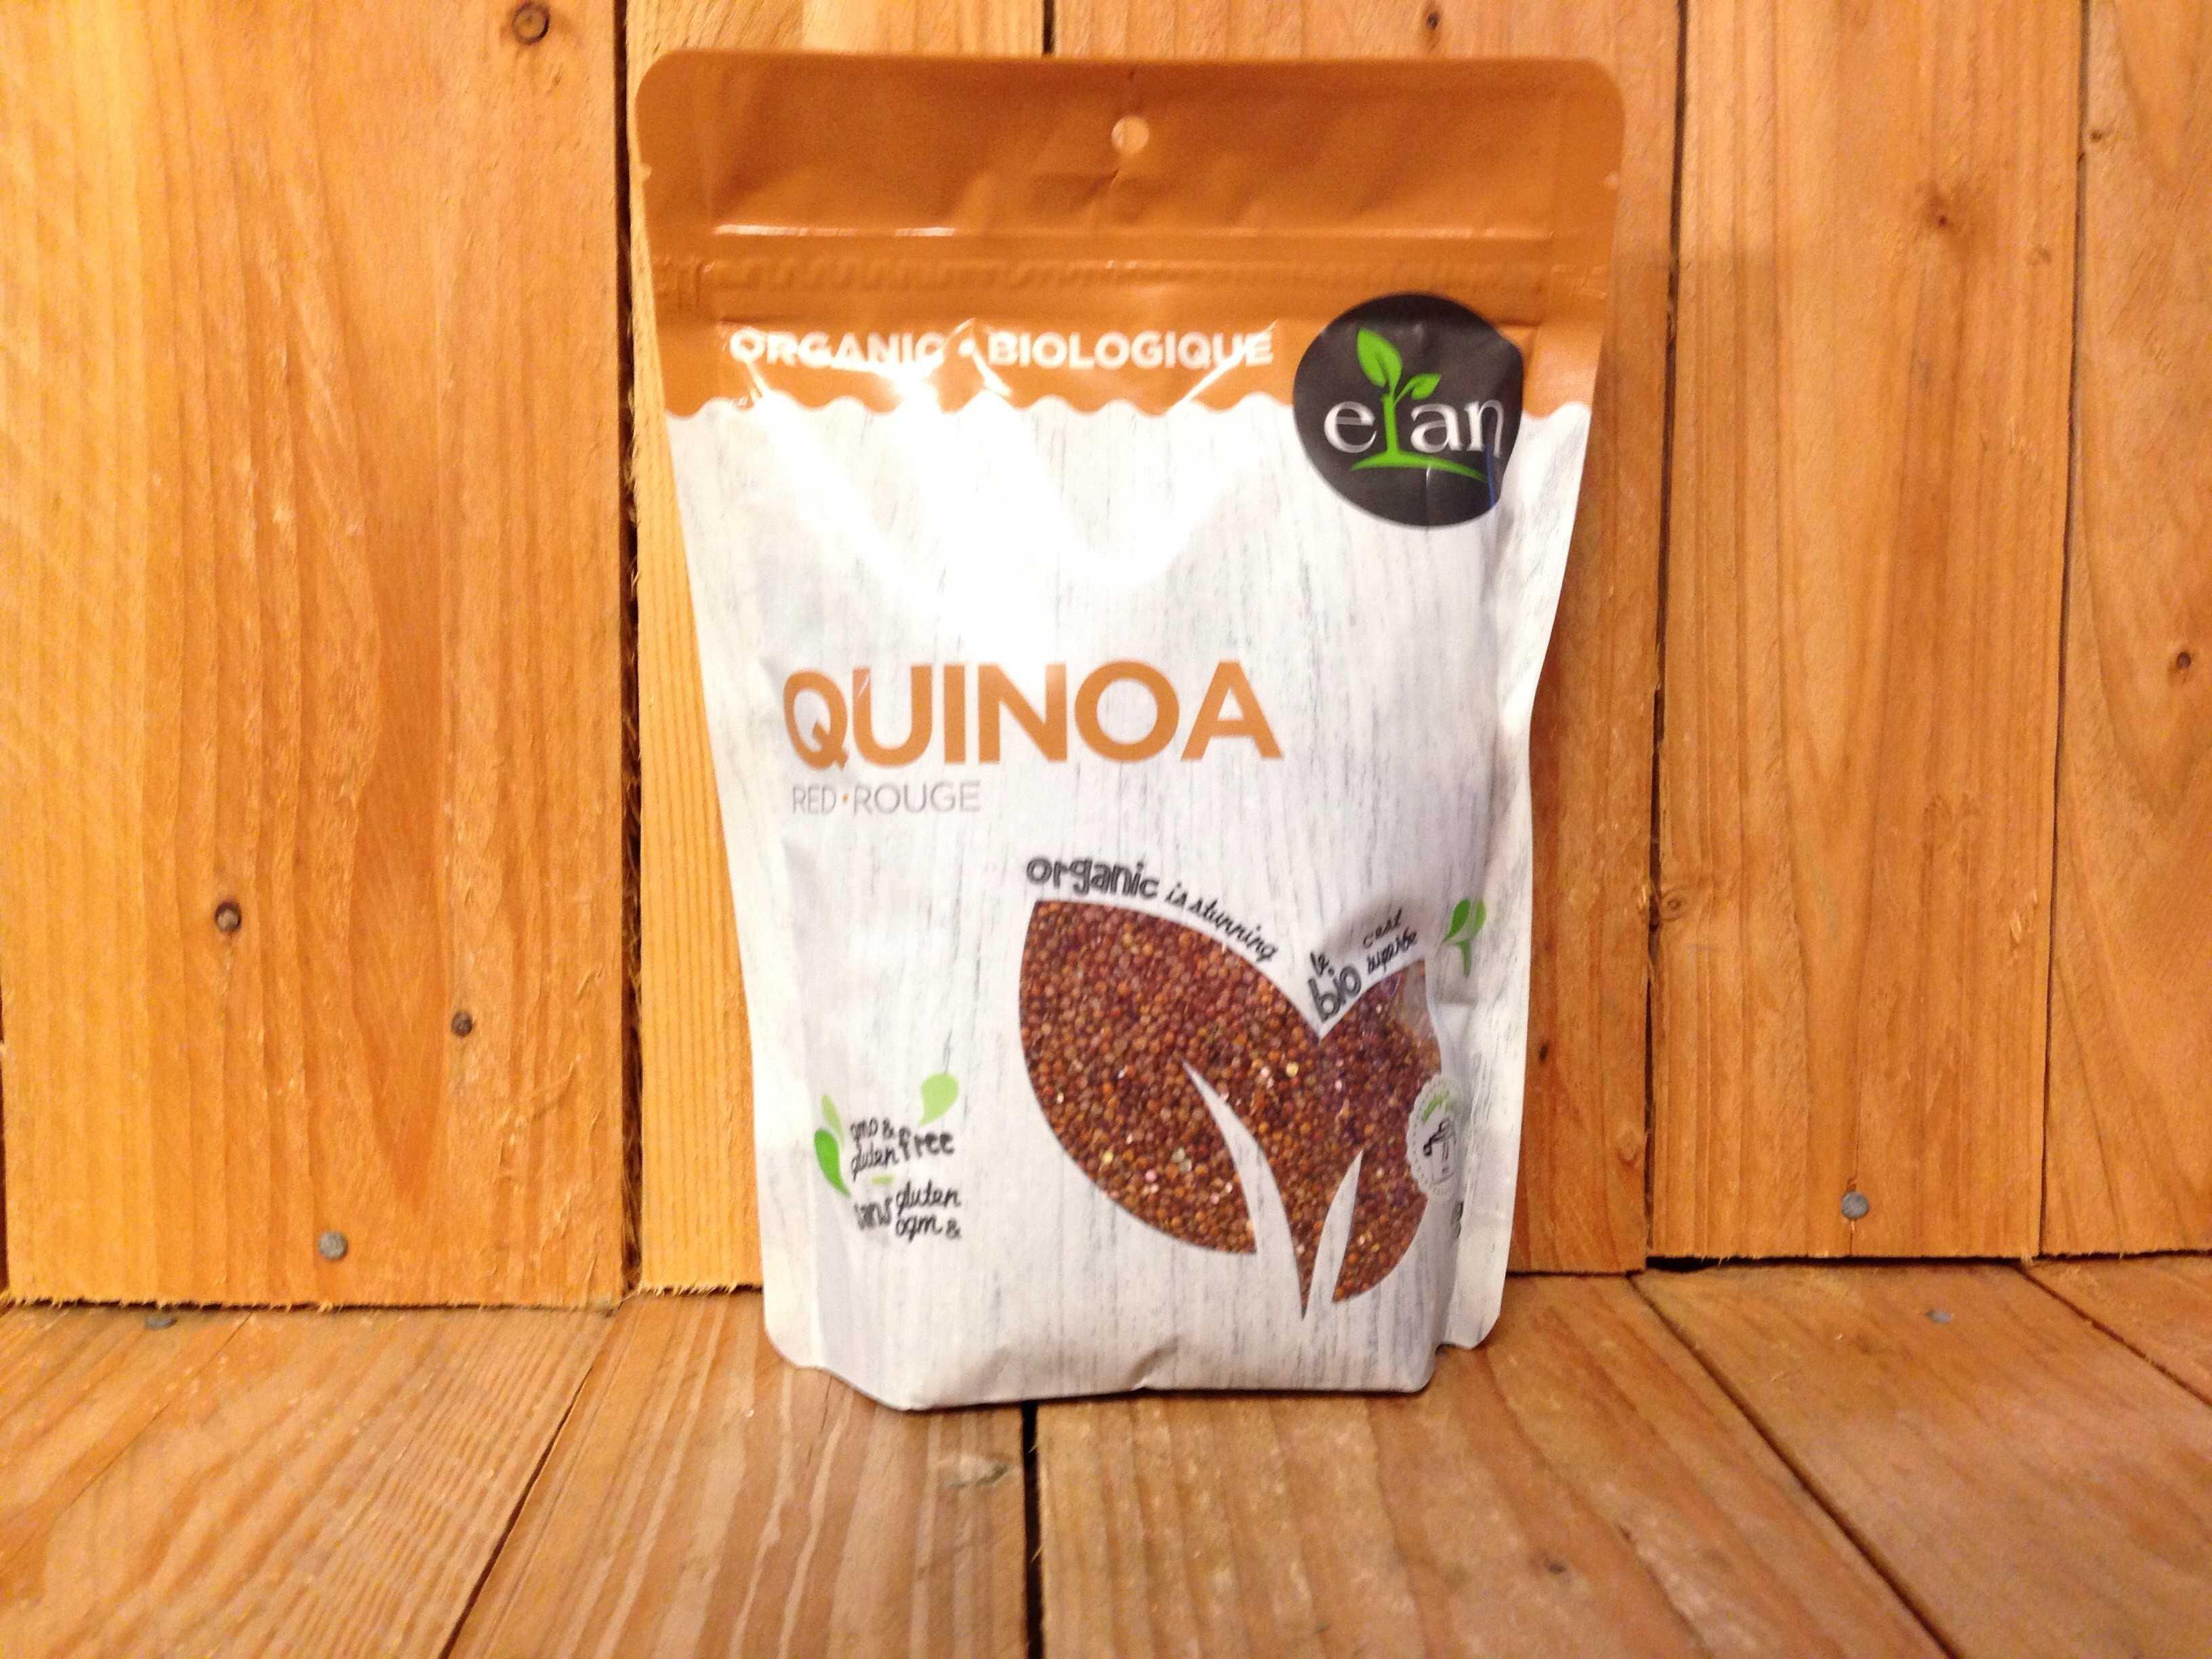 Elan – Organic Quinoa, Red (426g)